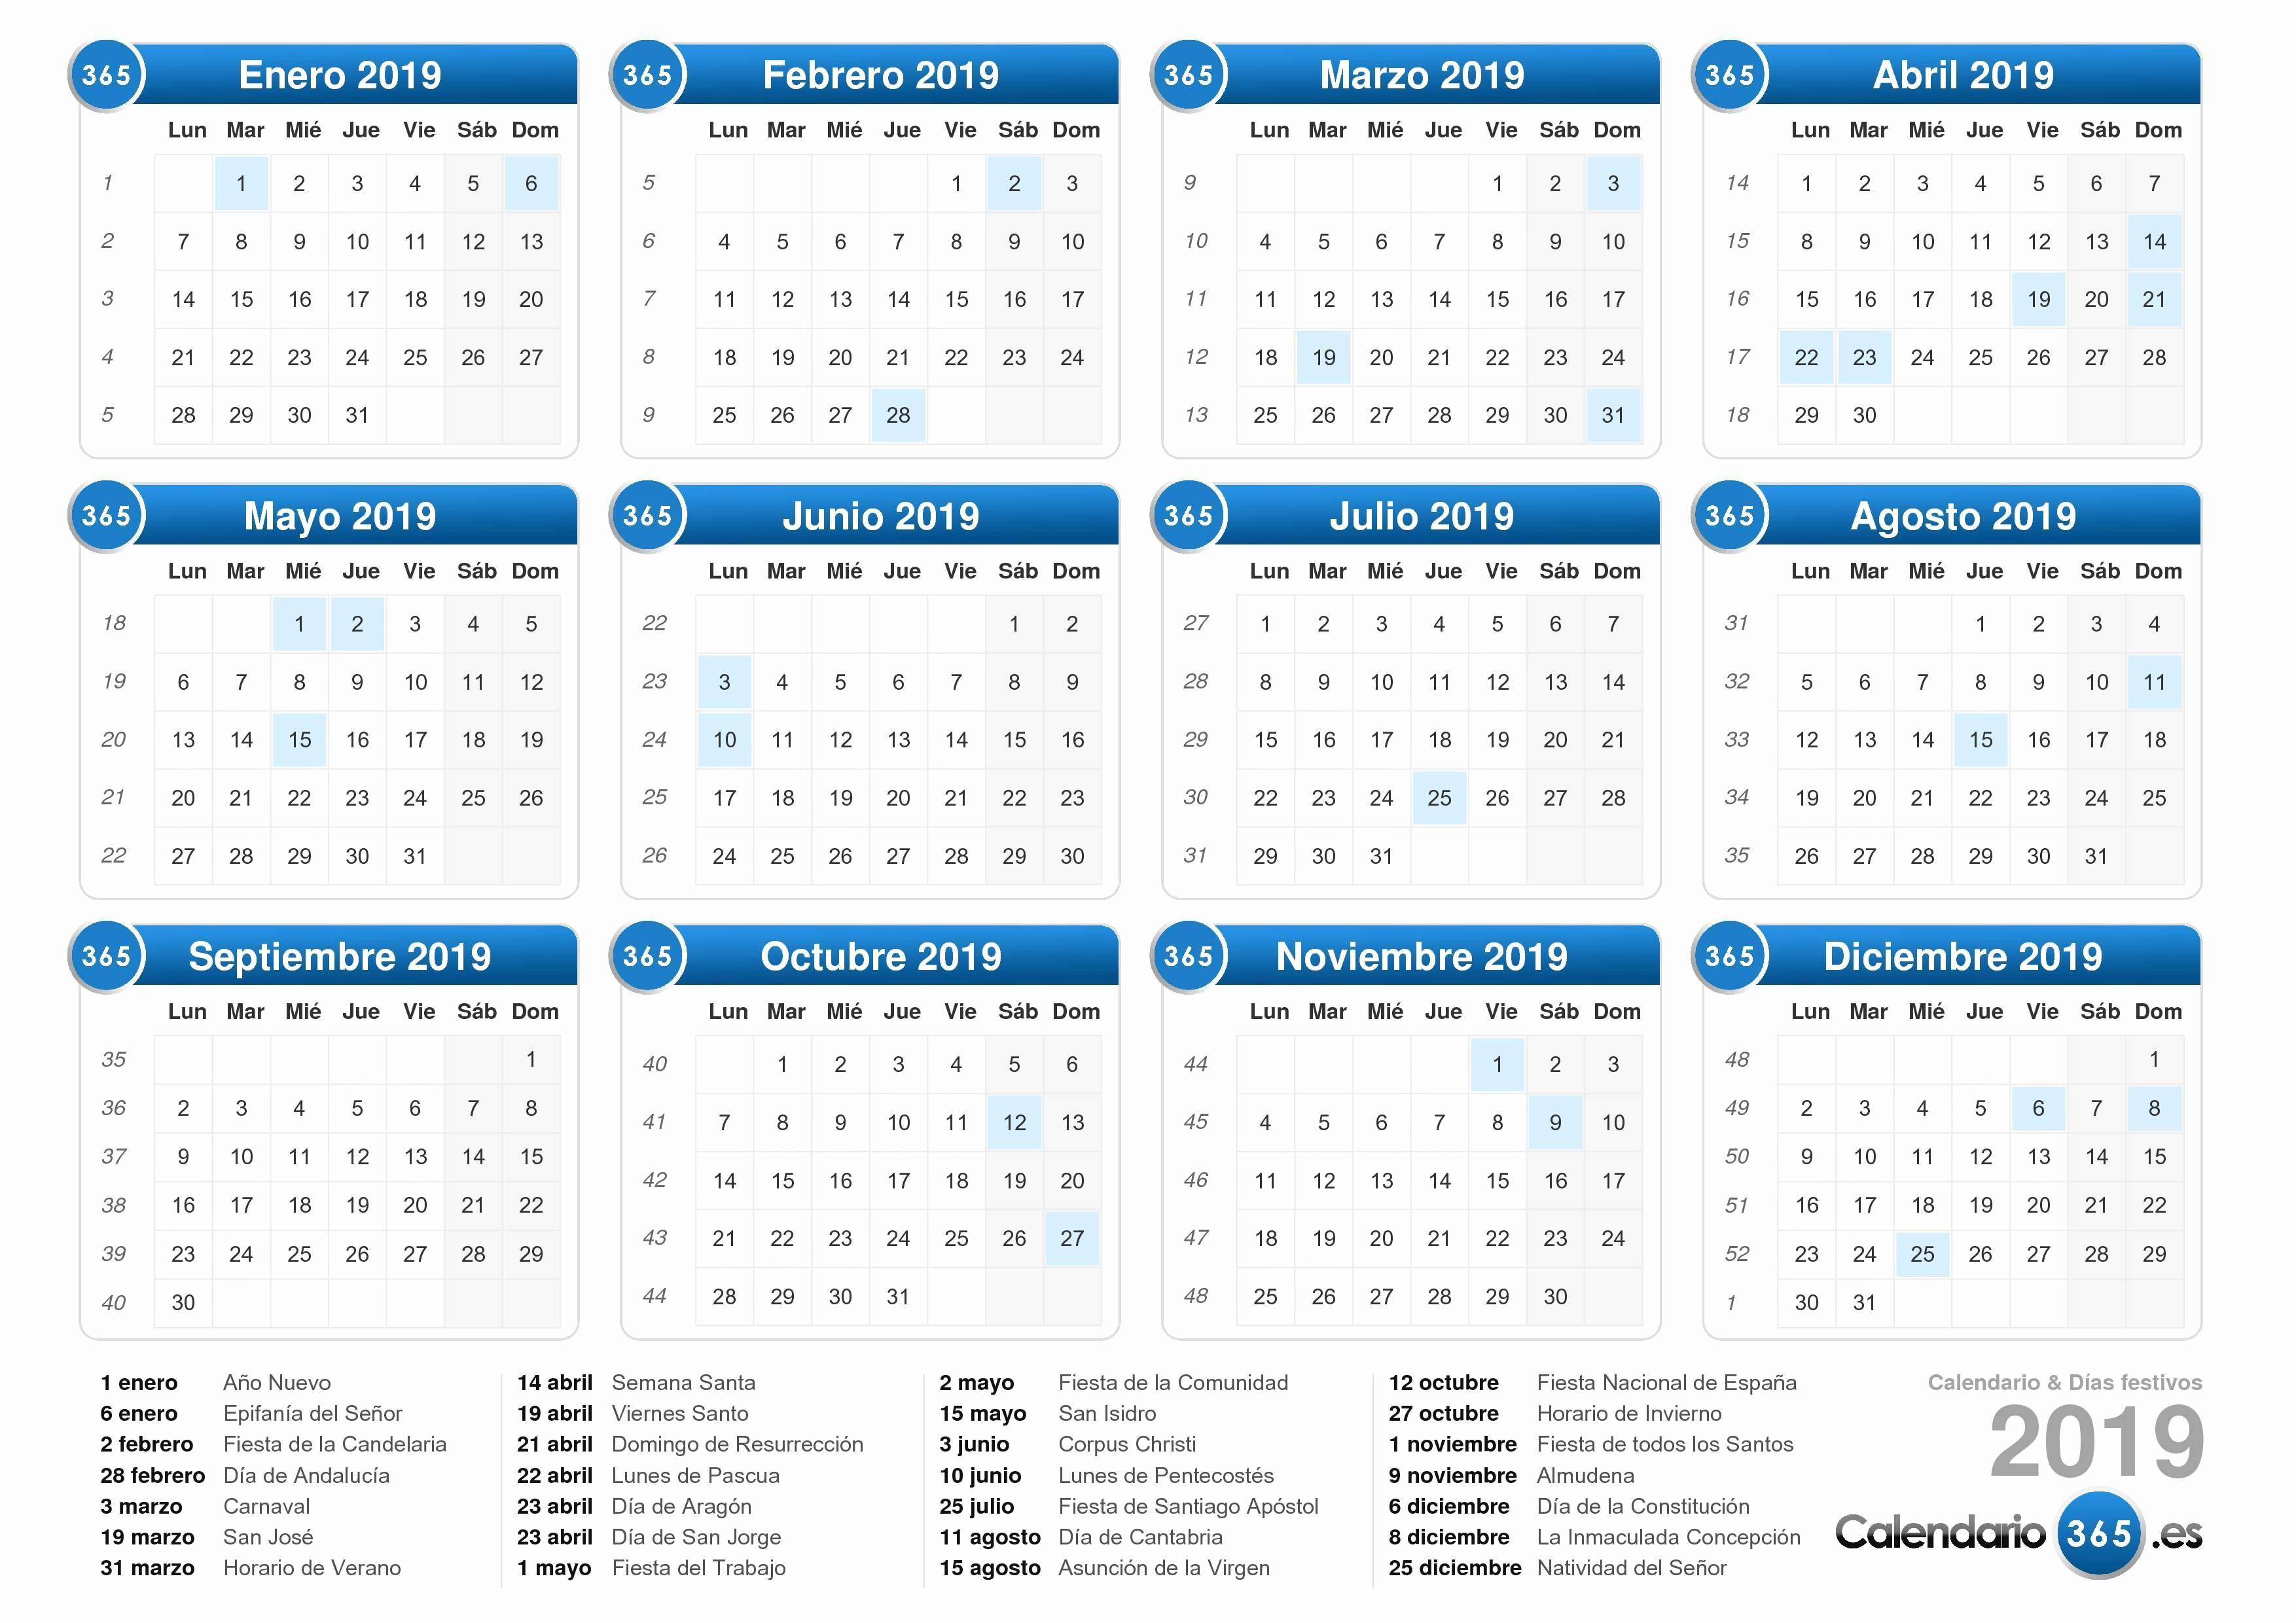 Ffm Calendarios 2019 Calendario 2019